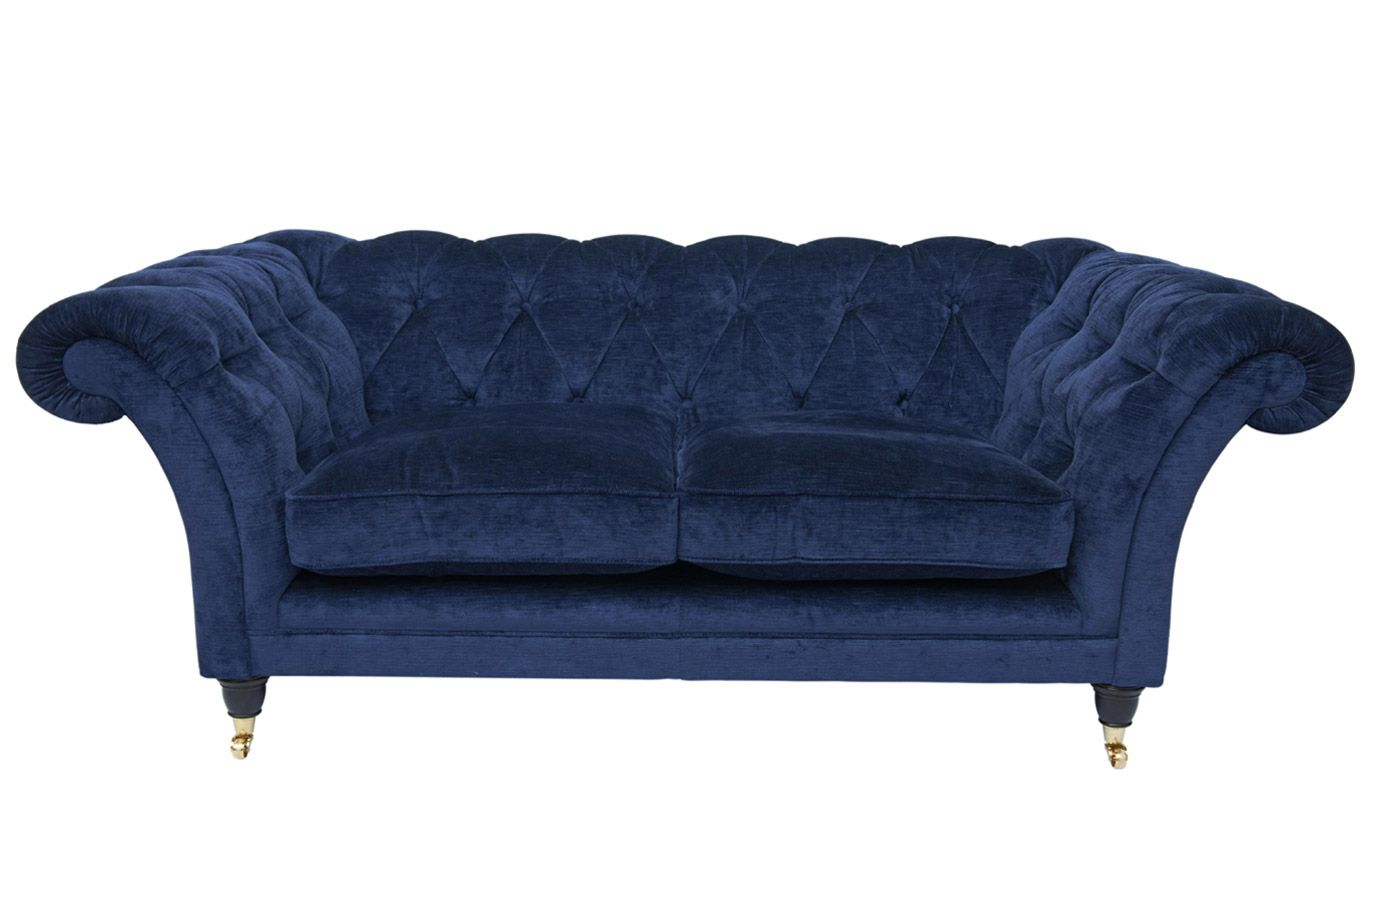 laura ashley hudson sofa new home pinterest laura. Black Bedroom Furniture Sets. Home Design Ideas